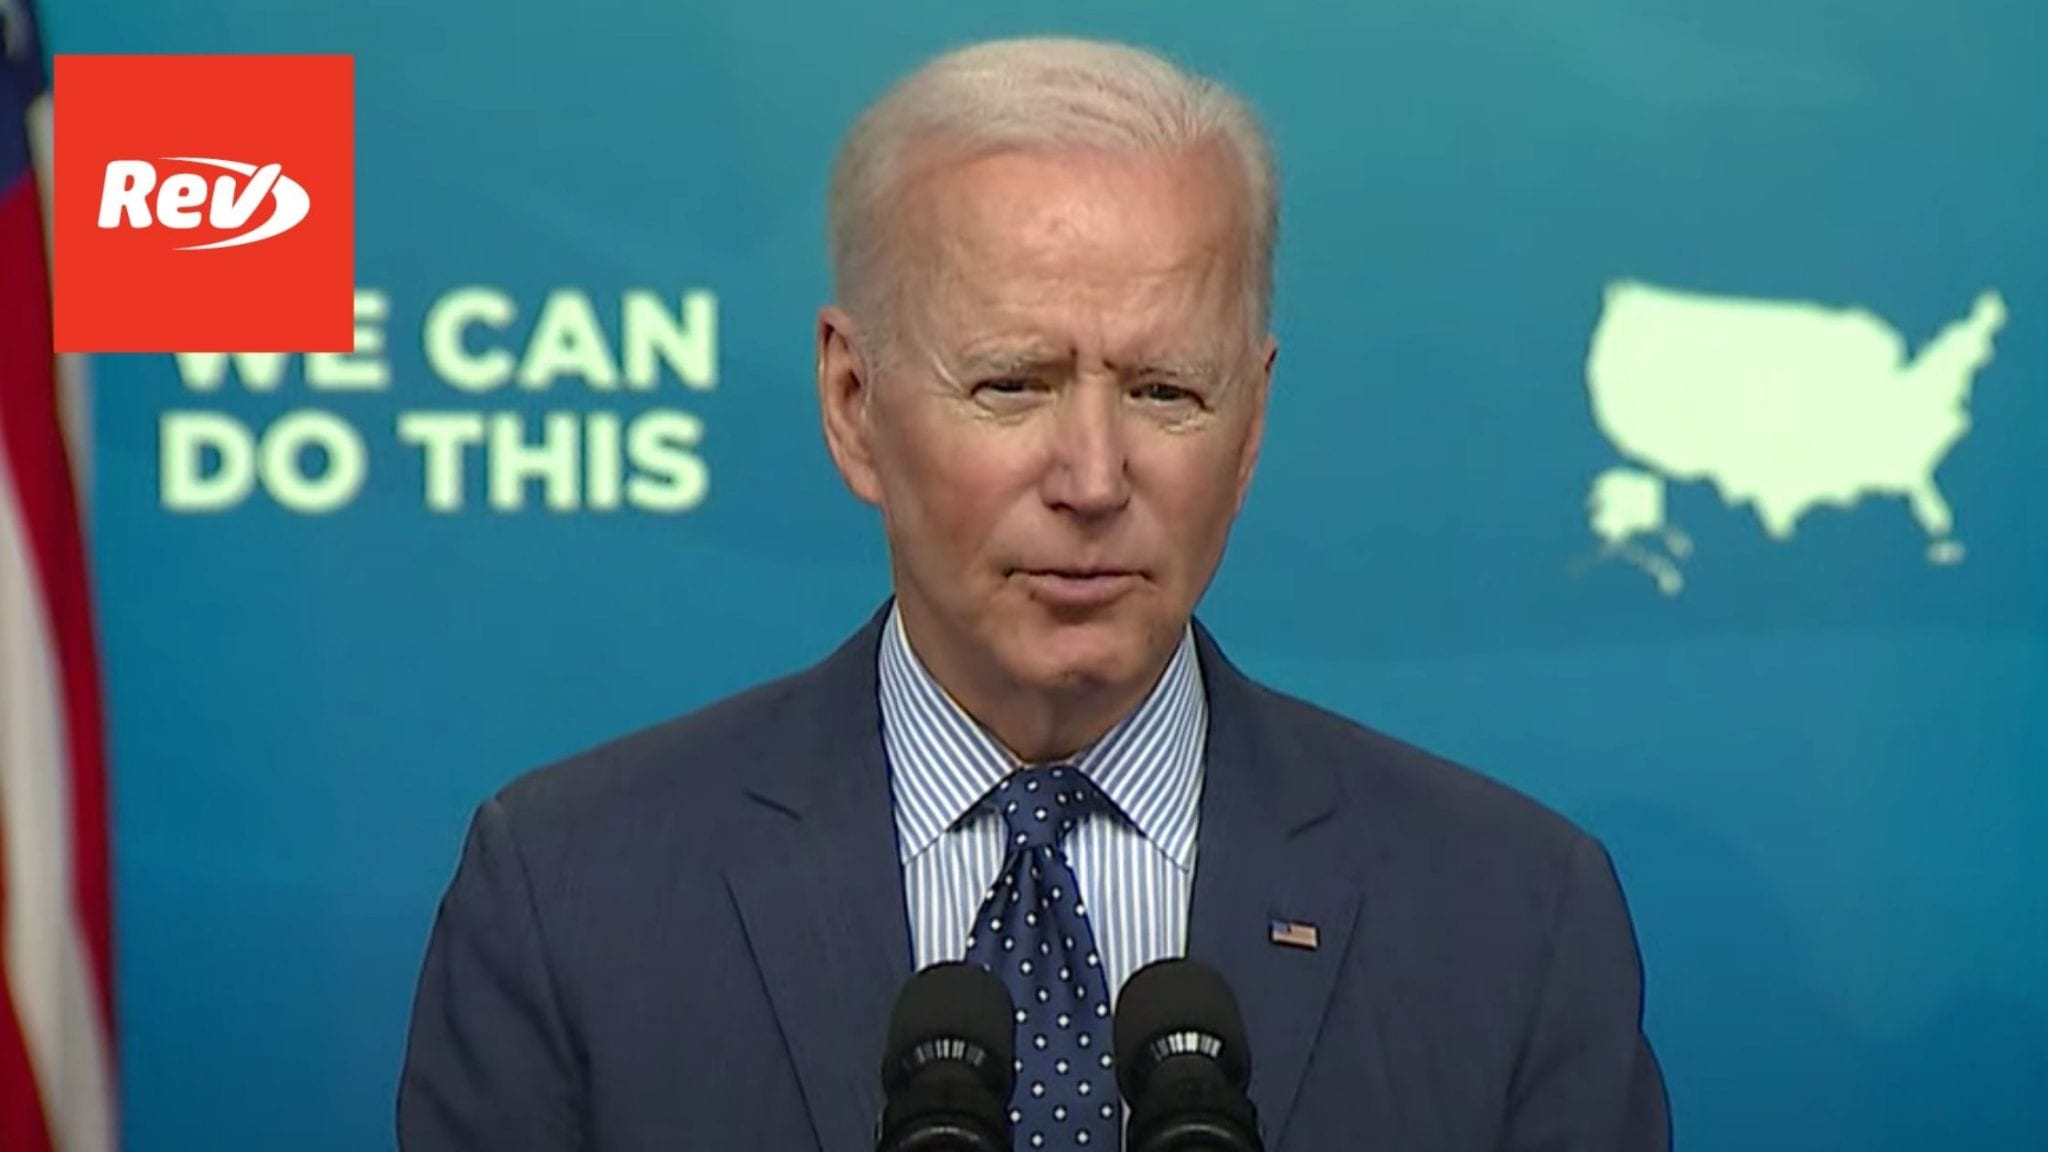 Joe Biden COVID-19 Response & Vaccine Distribution Speech Transcript June 2